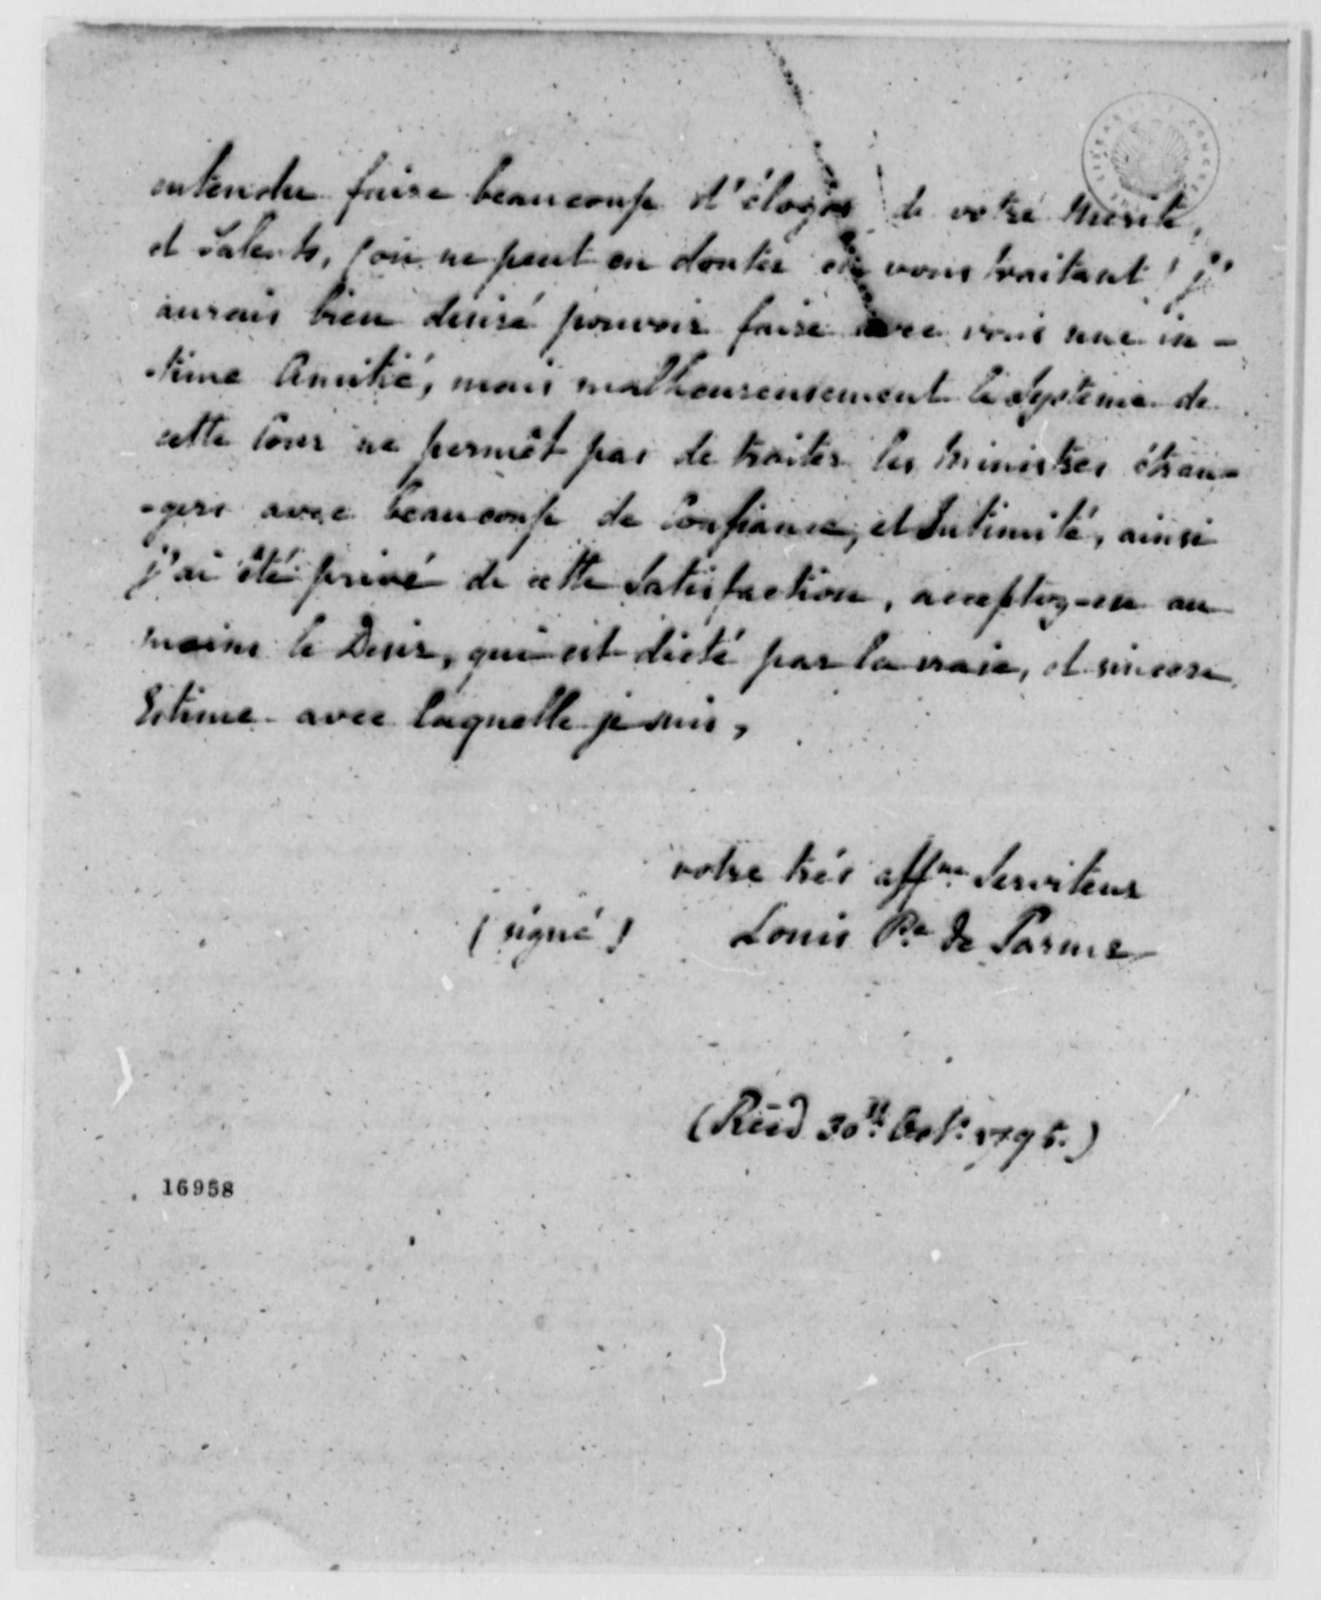 Louis de Parme to Thomas Pinckney, October 30, 1795, in French